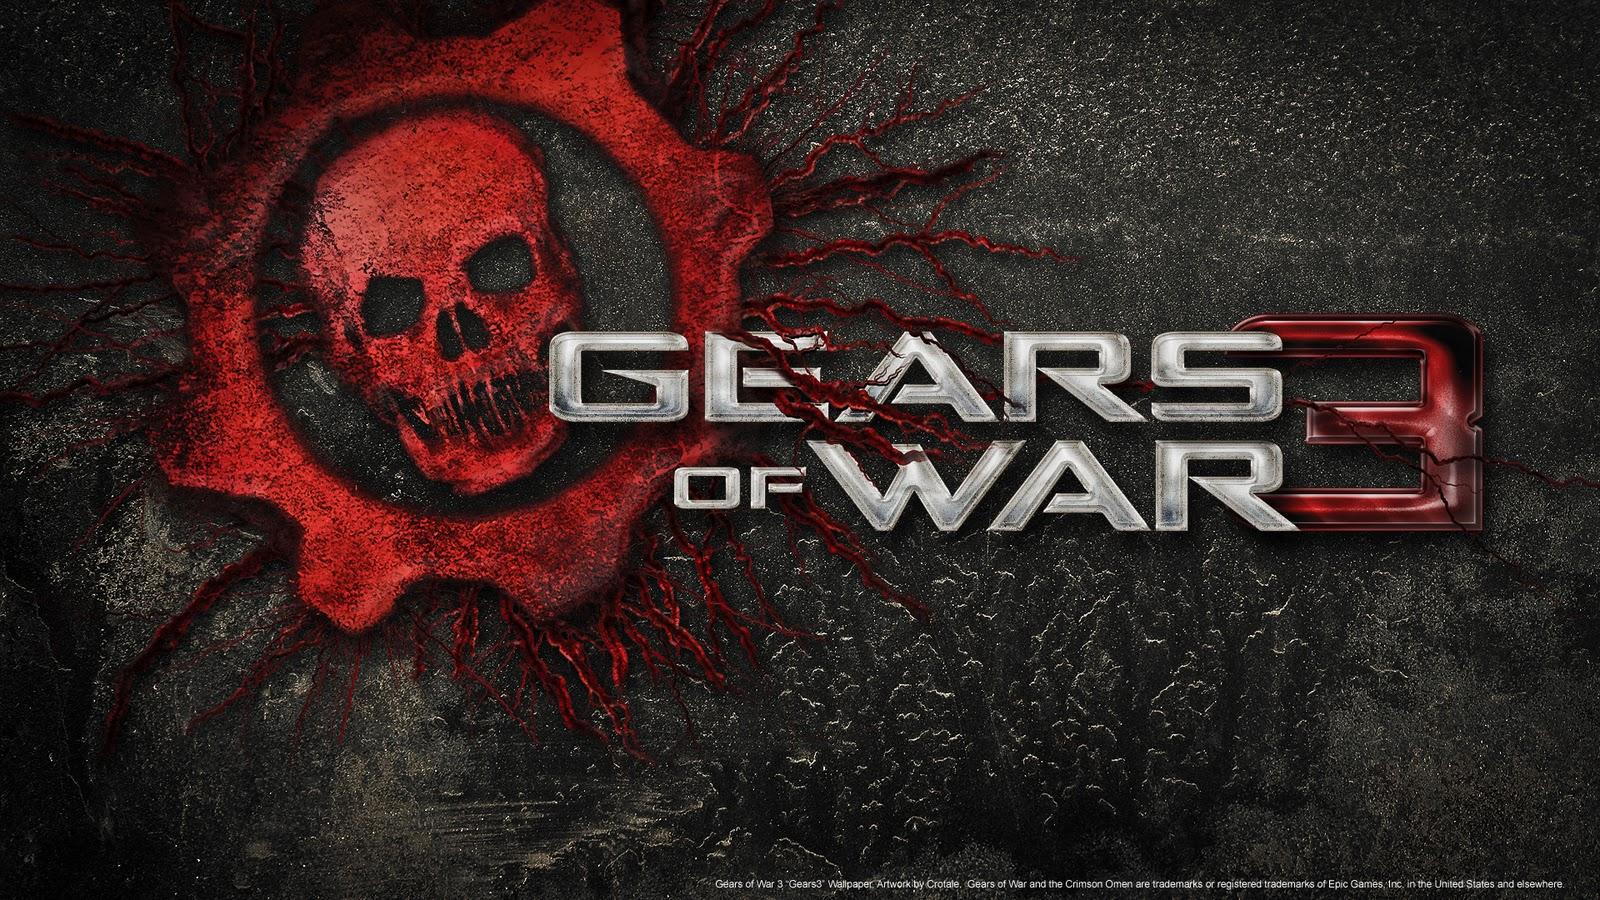 http://4.bp.blogspot.com/-nQ5vgodYdOA/TnaaNY4UK8I/AAAAAAAAAXI/jHpVcrbgzYQ/s1600/gears-of-war-3-wallpaper-13.jpg